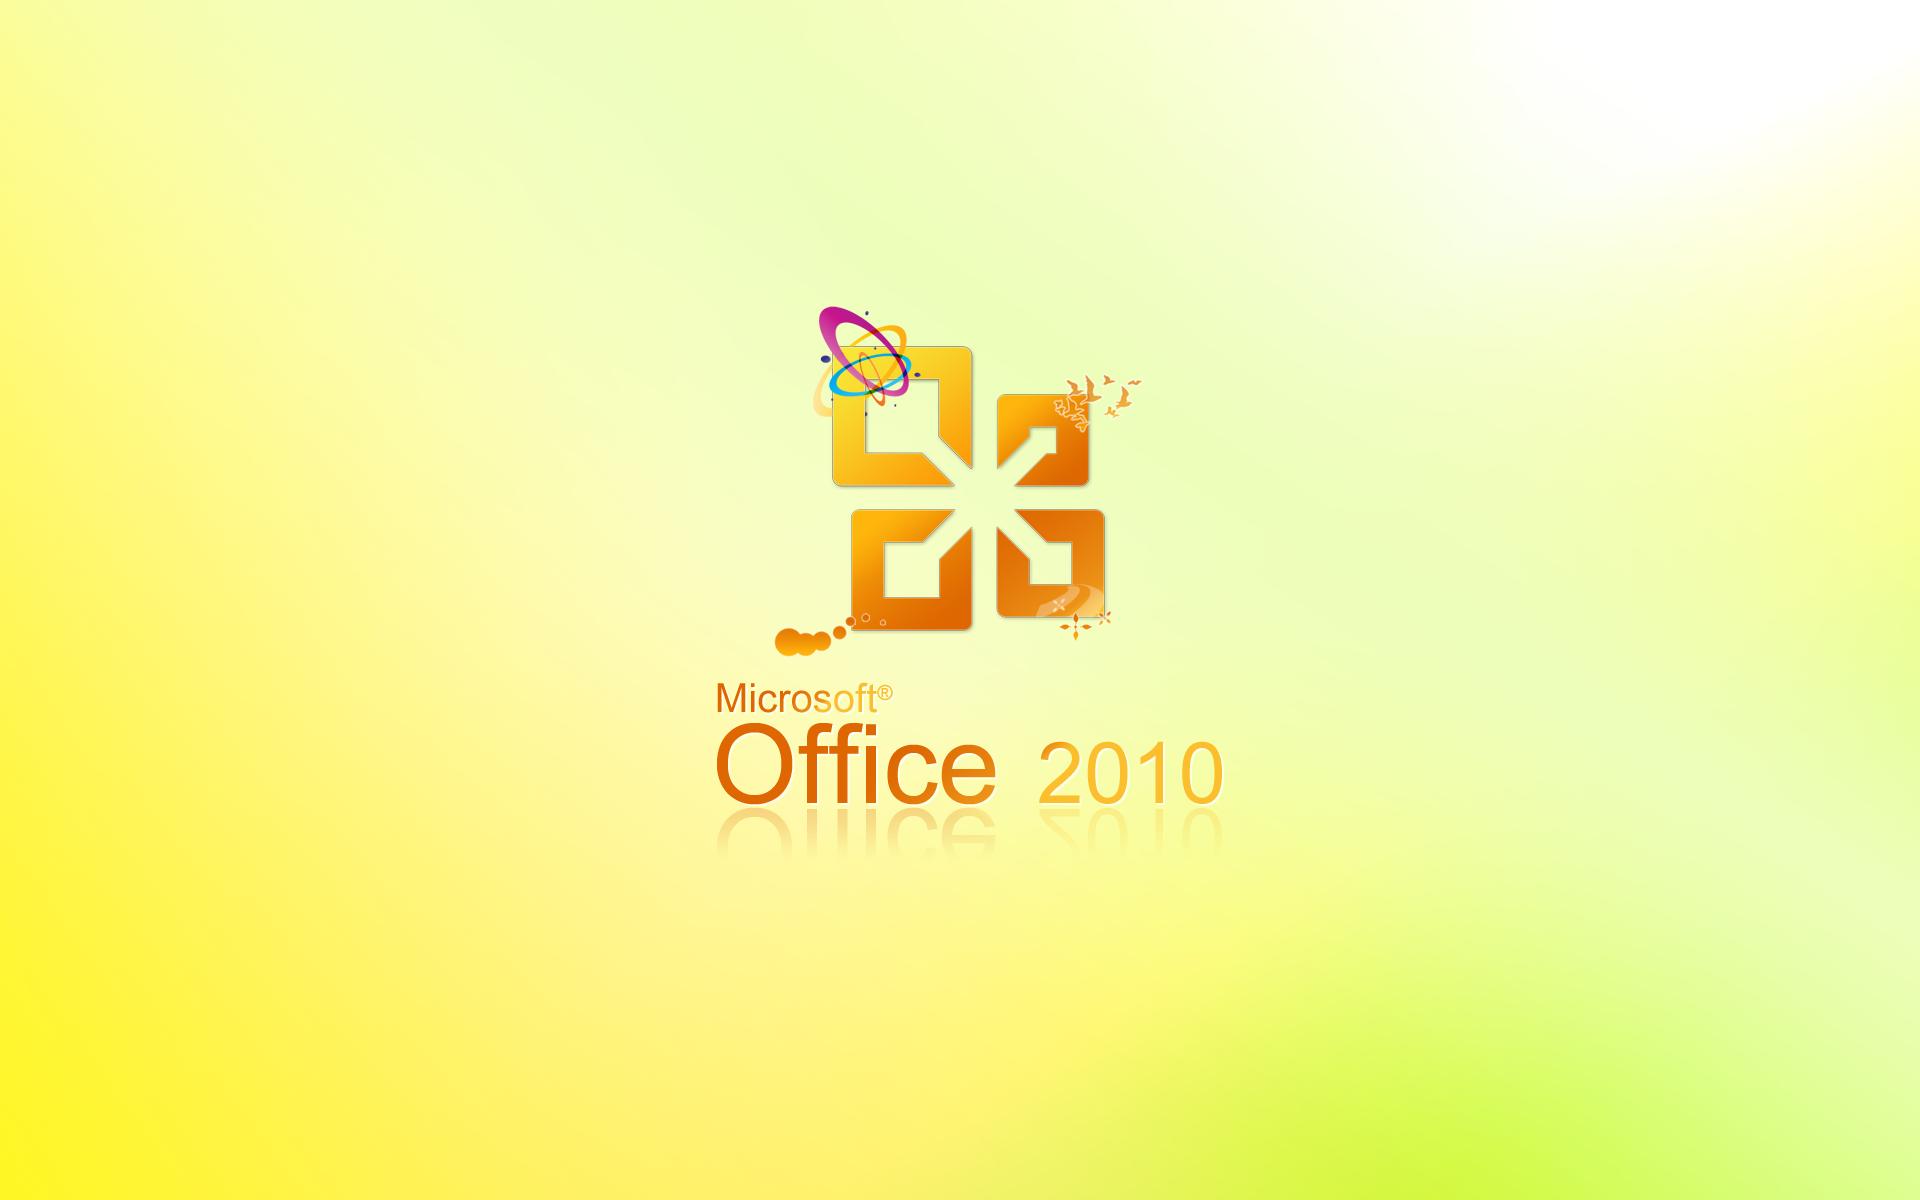 Microsoft Office Wallpaper 10